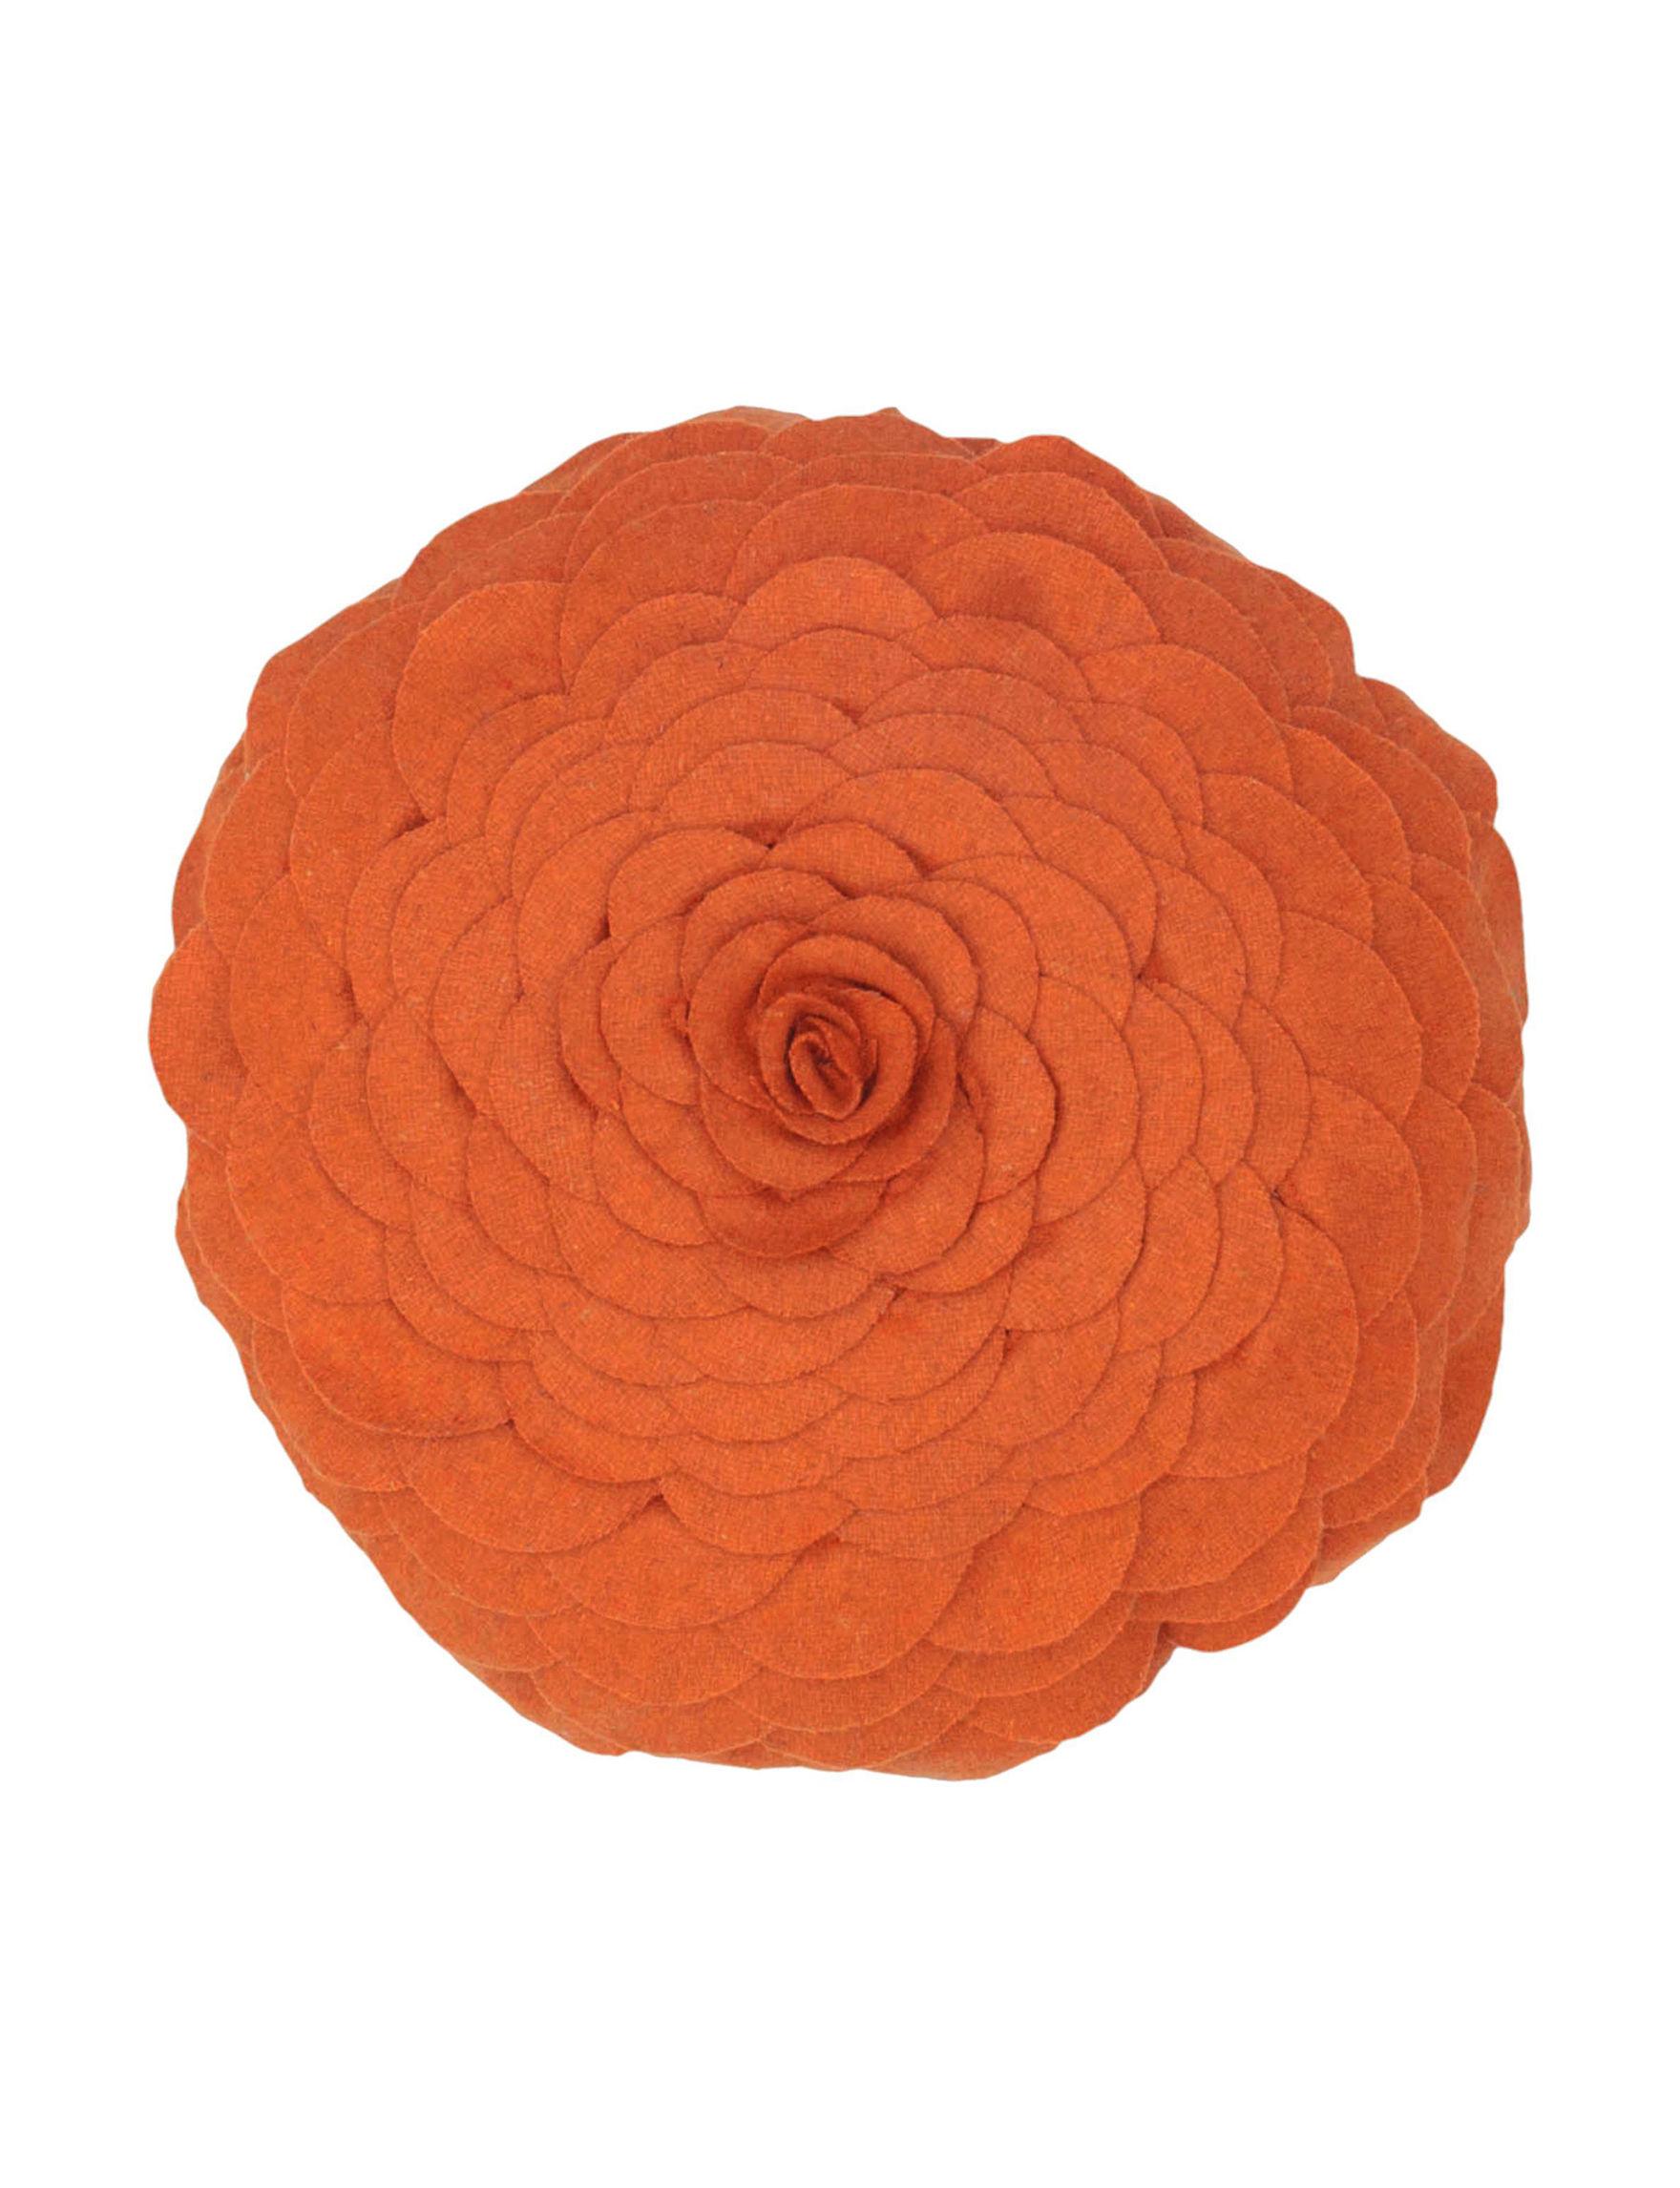 Rizzy Home Orange Floral Decorative Pillows